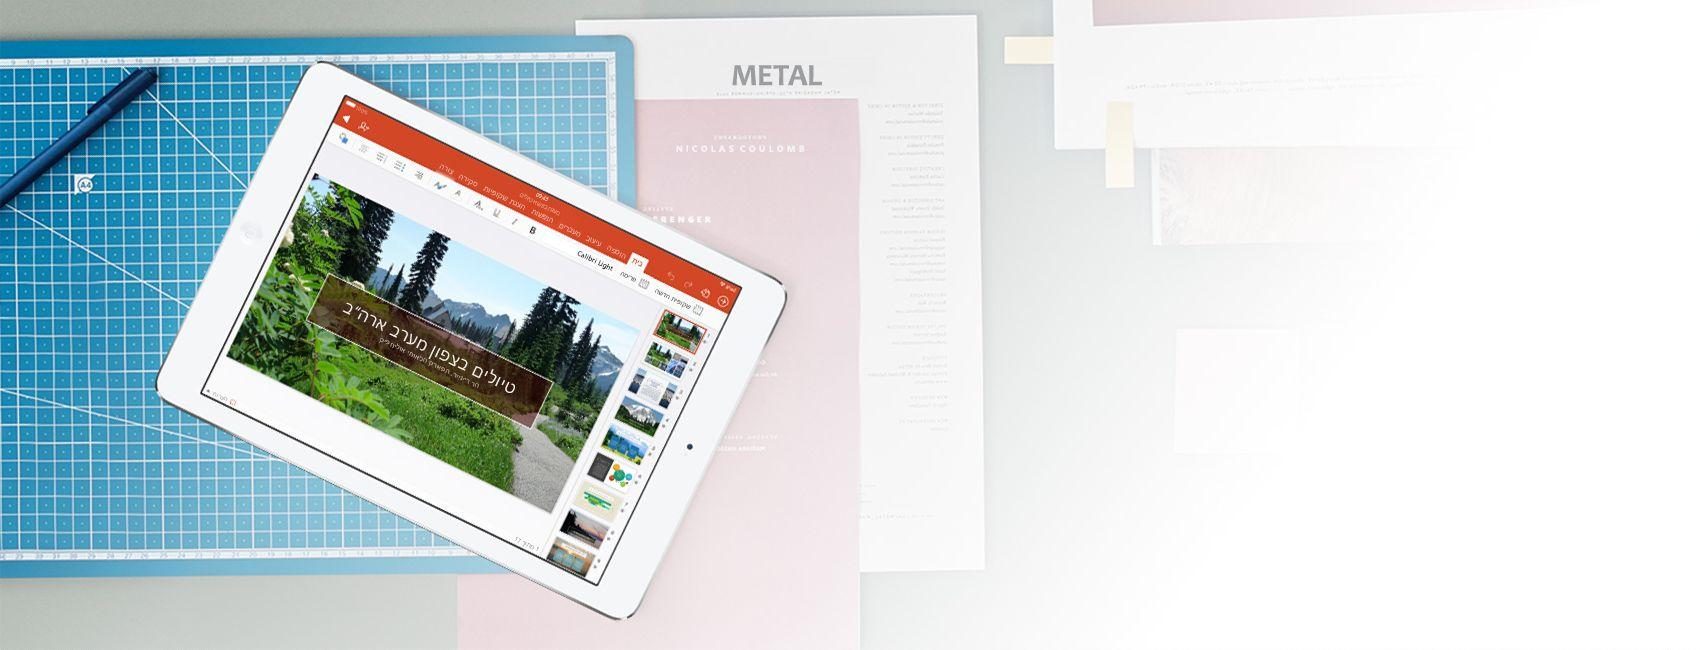 iPad המציג מצגת של PowerPoint לגבי טיולים בצפון מערב ארצות הברית